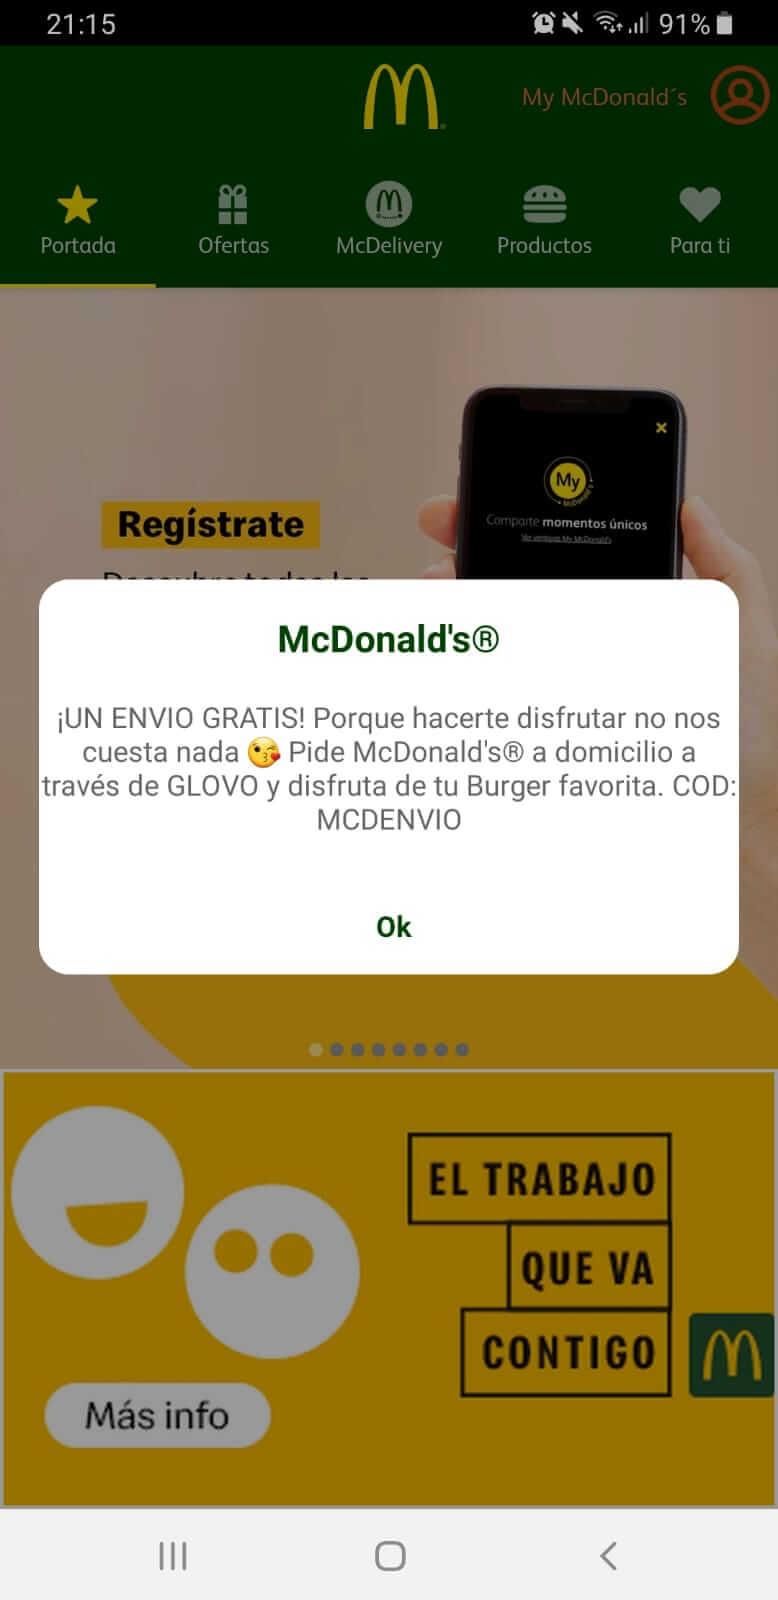 mcdonalds oferta envio gratis